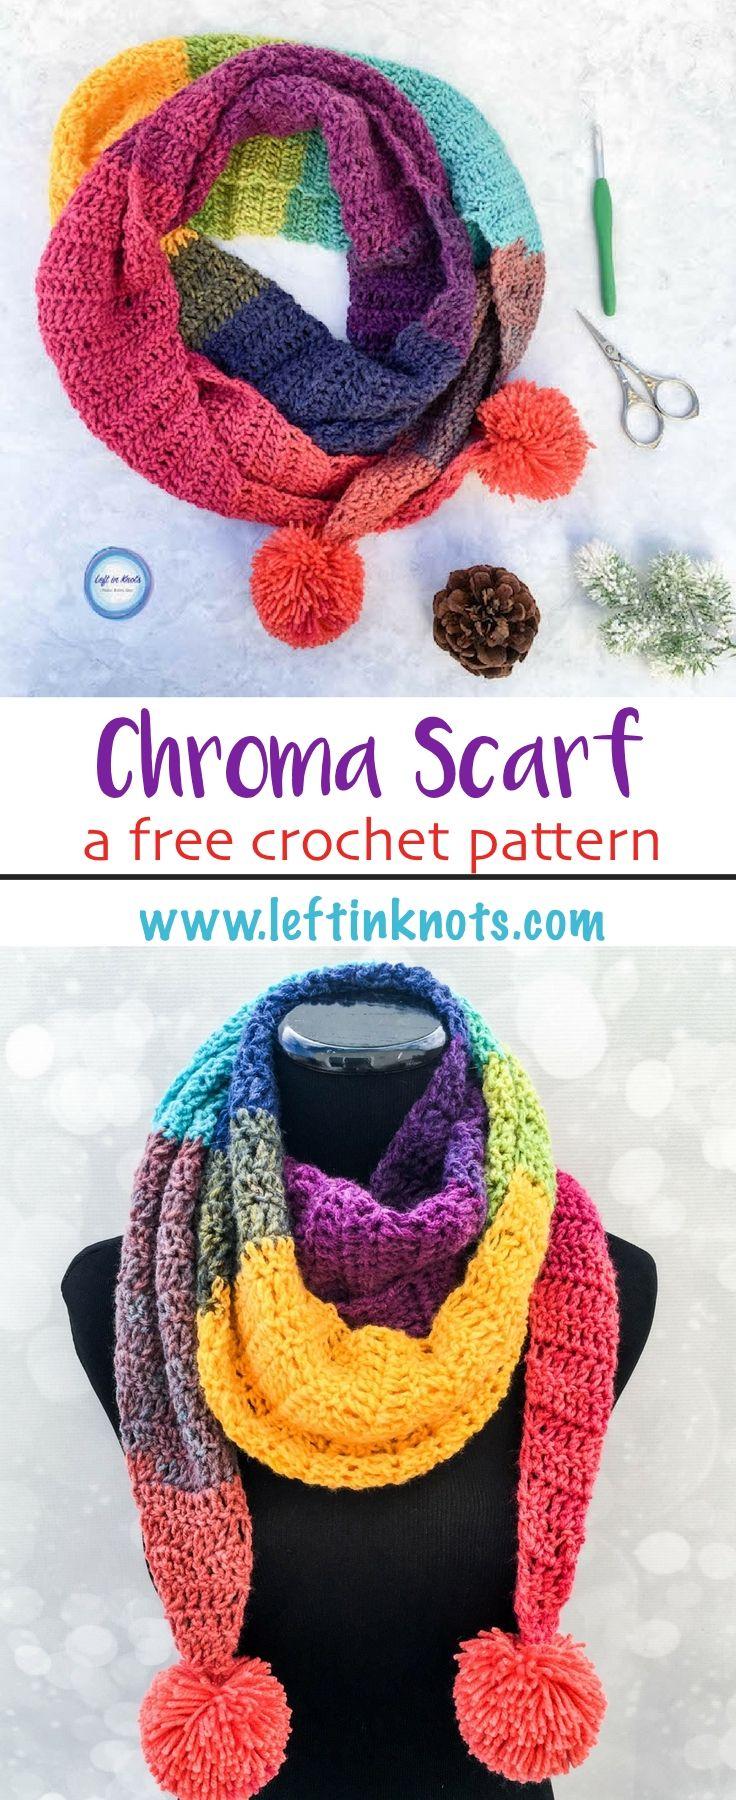 Chroma Scarf | Mandala, Lions and Yarns